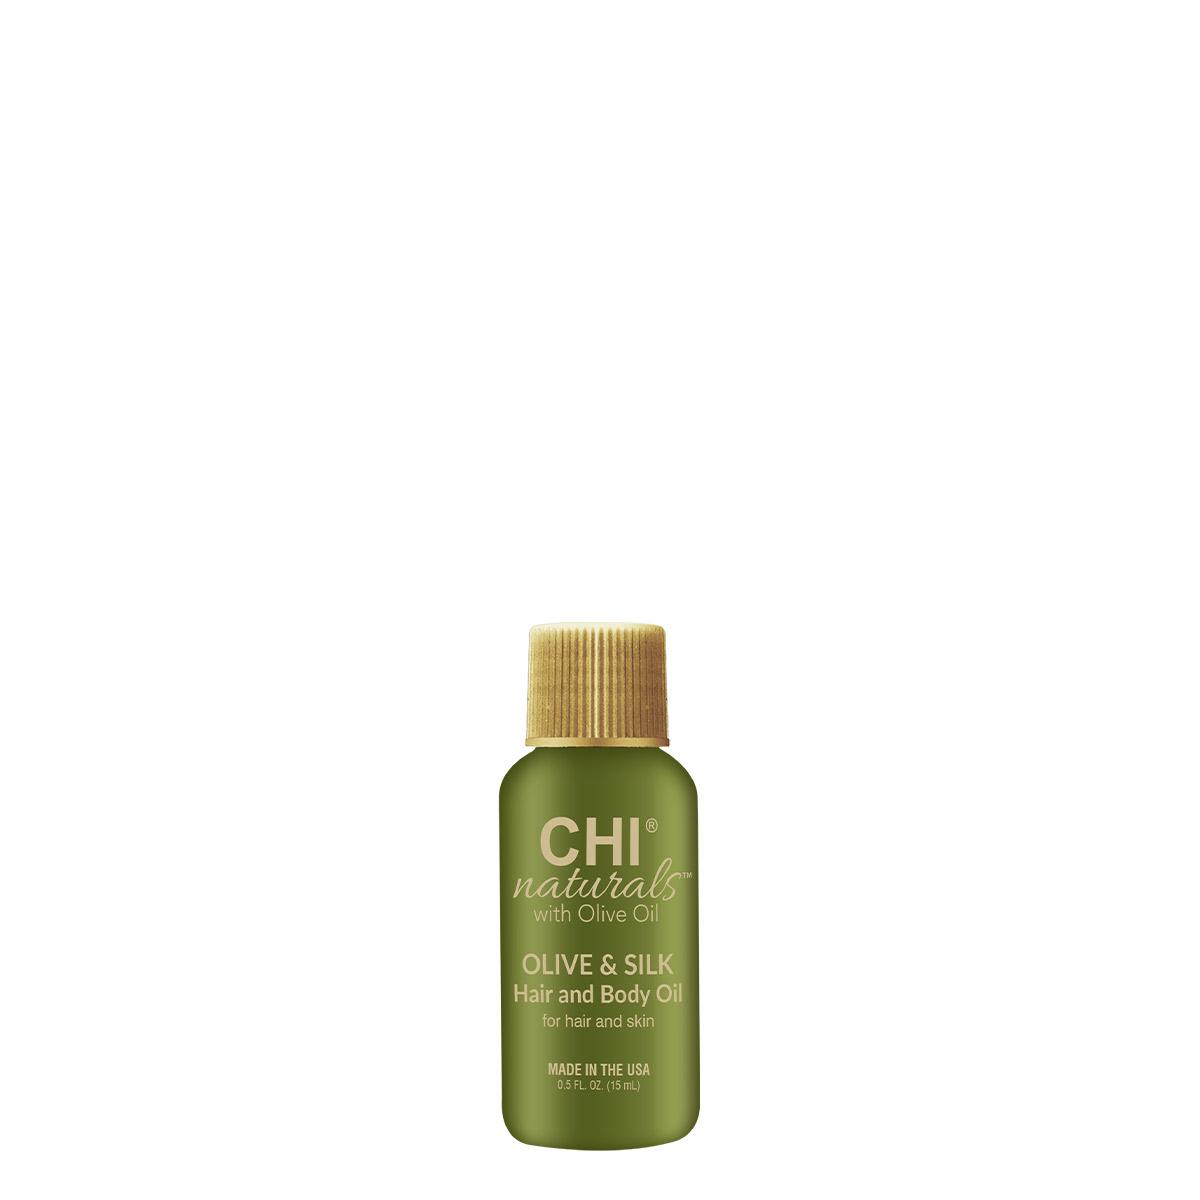 CHI Olive Organics Масло оливы для волос и тела, 15мл